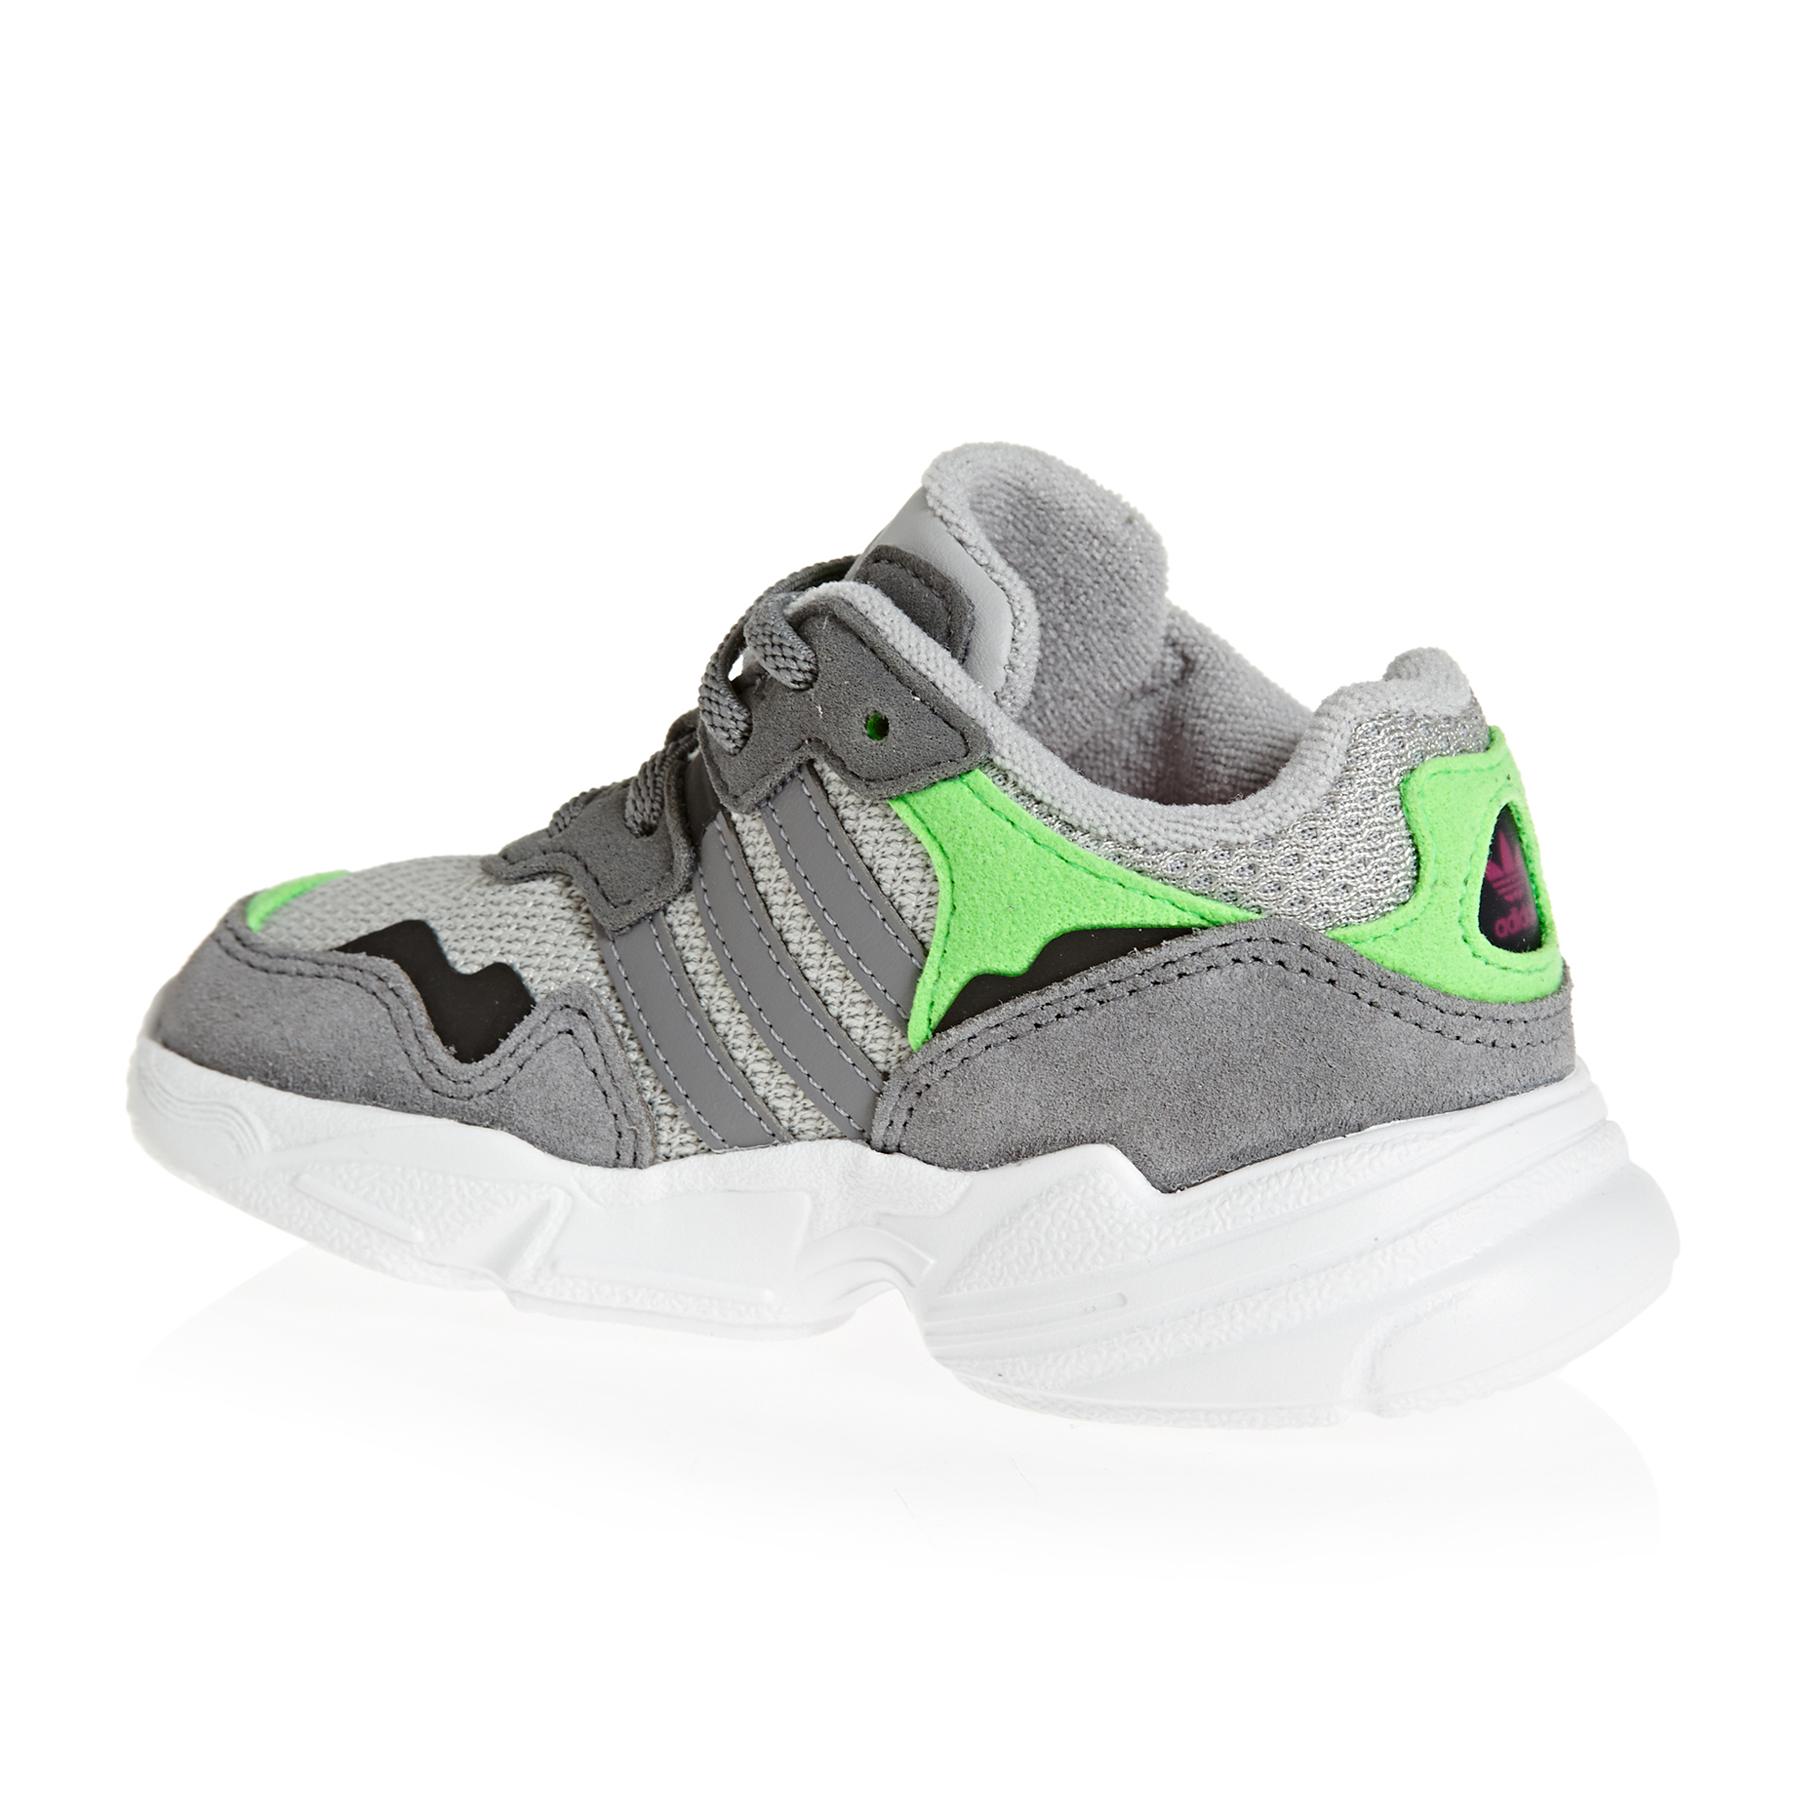 adidas Originals Yung 96 Shoes Casual Sporting goods